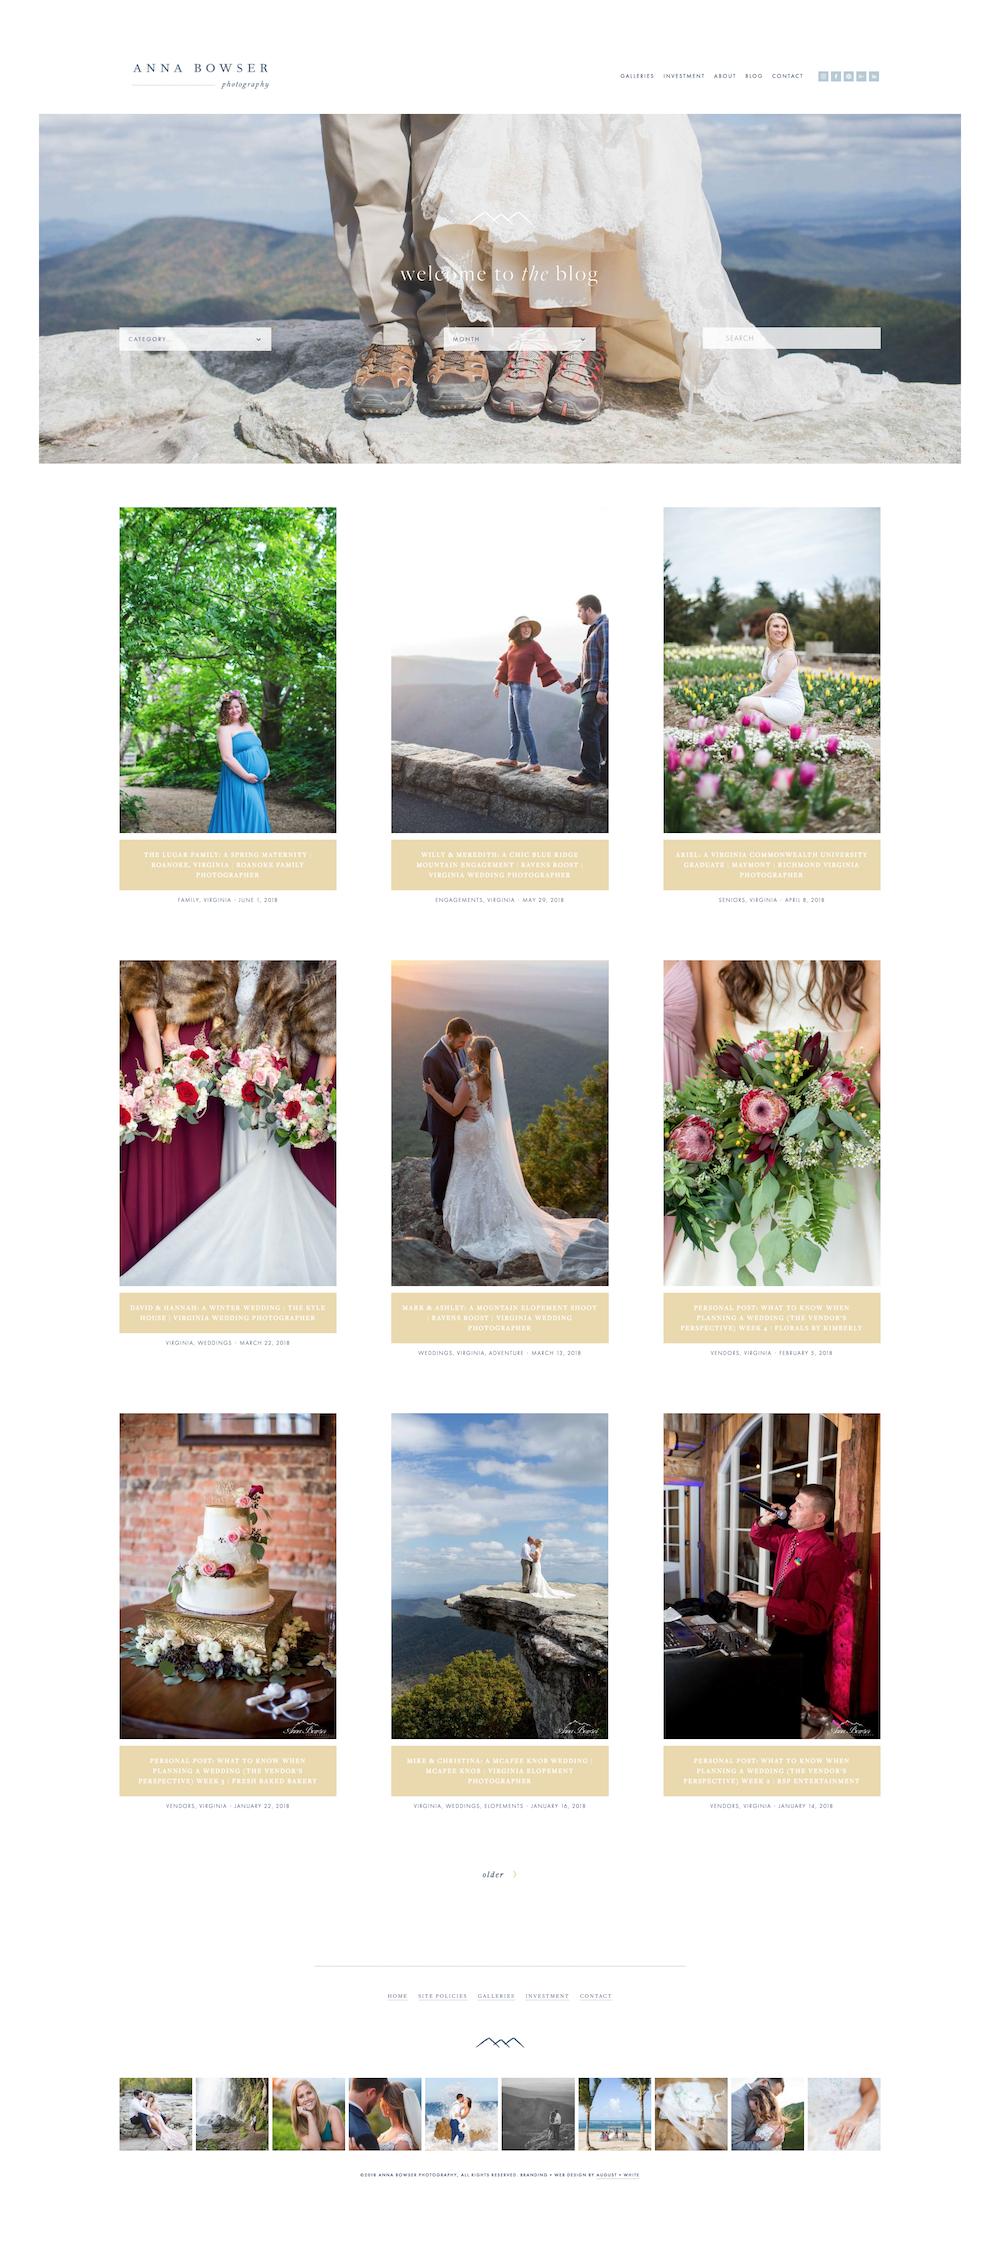 Blog - Virginia Wedding and Elopement Photographer - 08_03 - 169.png